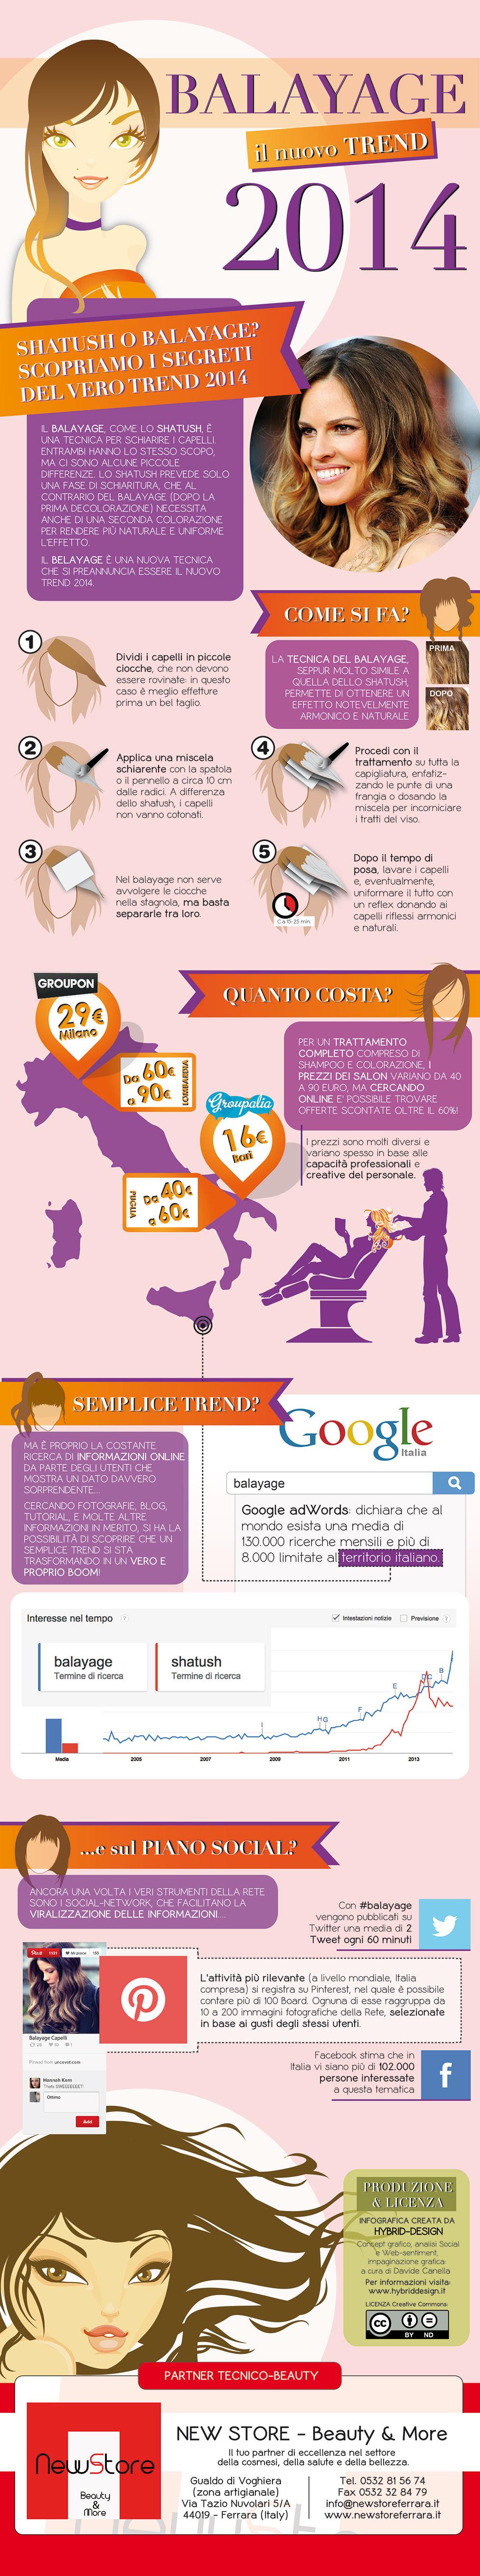 #Infografica #infographic #marketing spot advertising 3.0